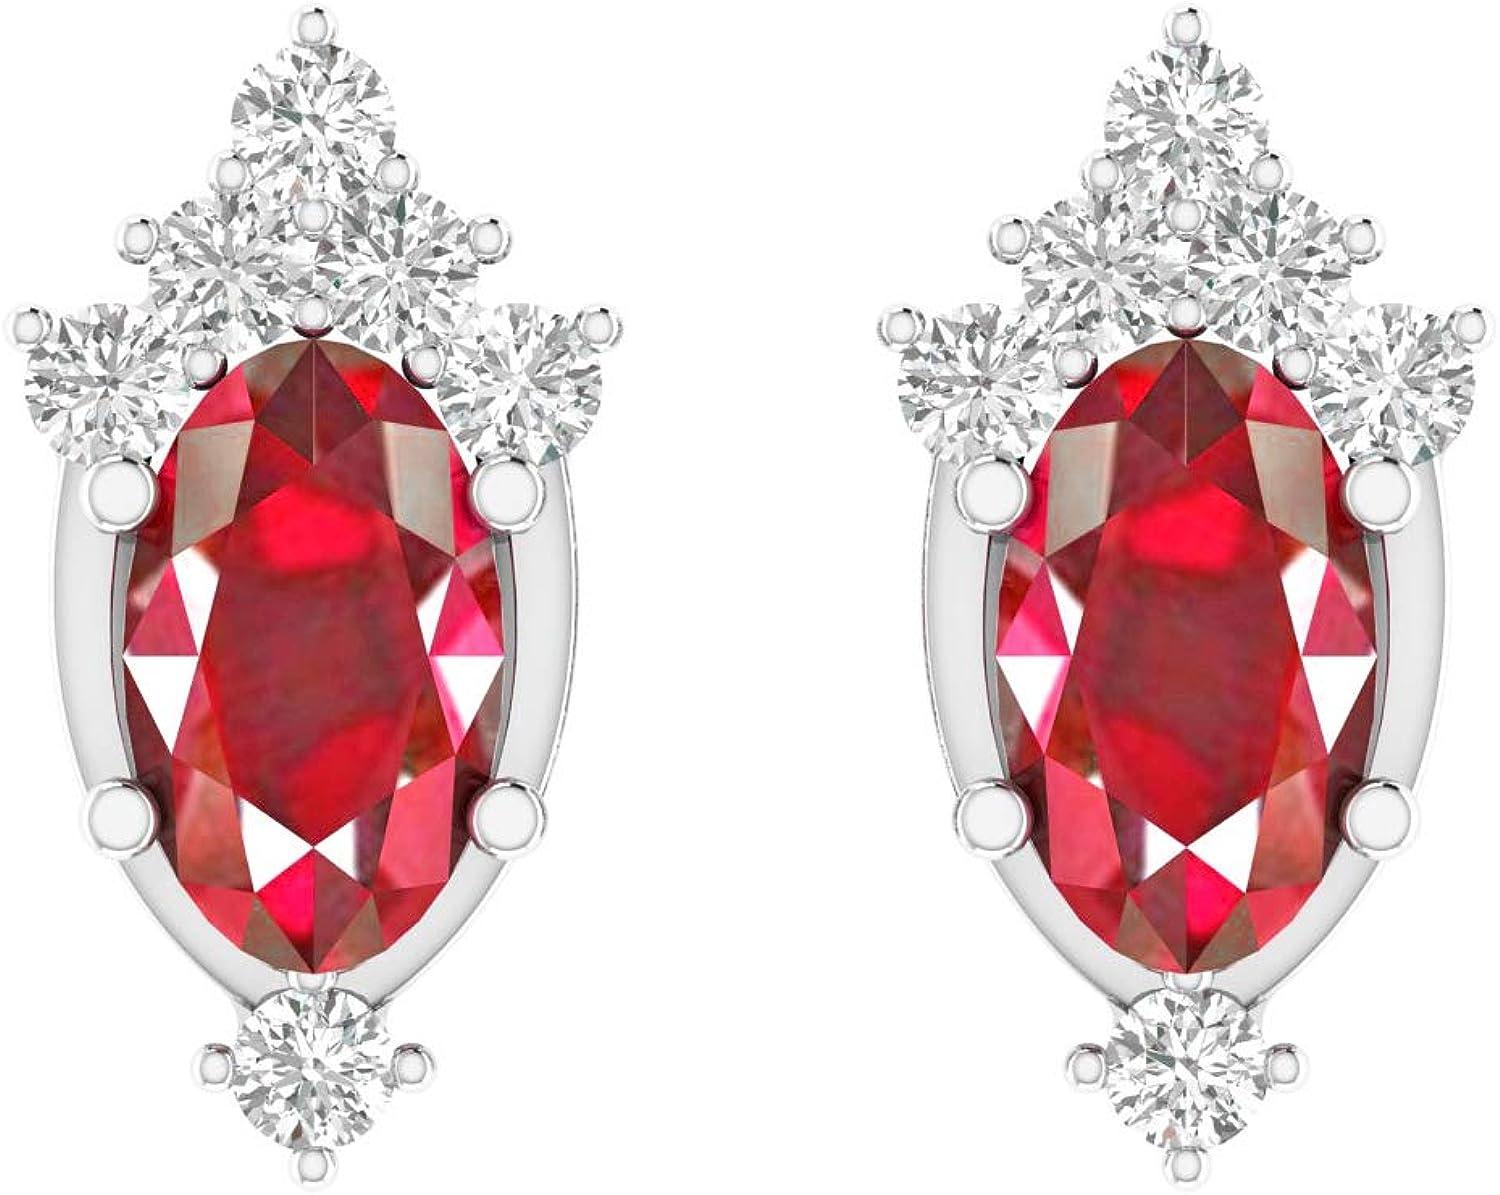 ASHNE JEWELS Max 80% OFF IGI Certified 0.12ct C White Diamond Natural I1-I2 Max 67% OFF